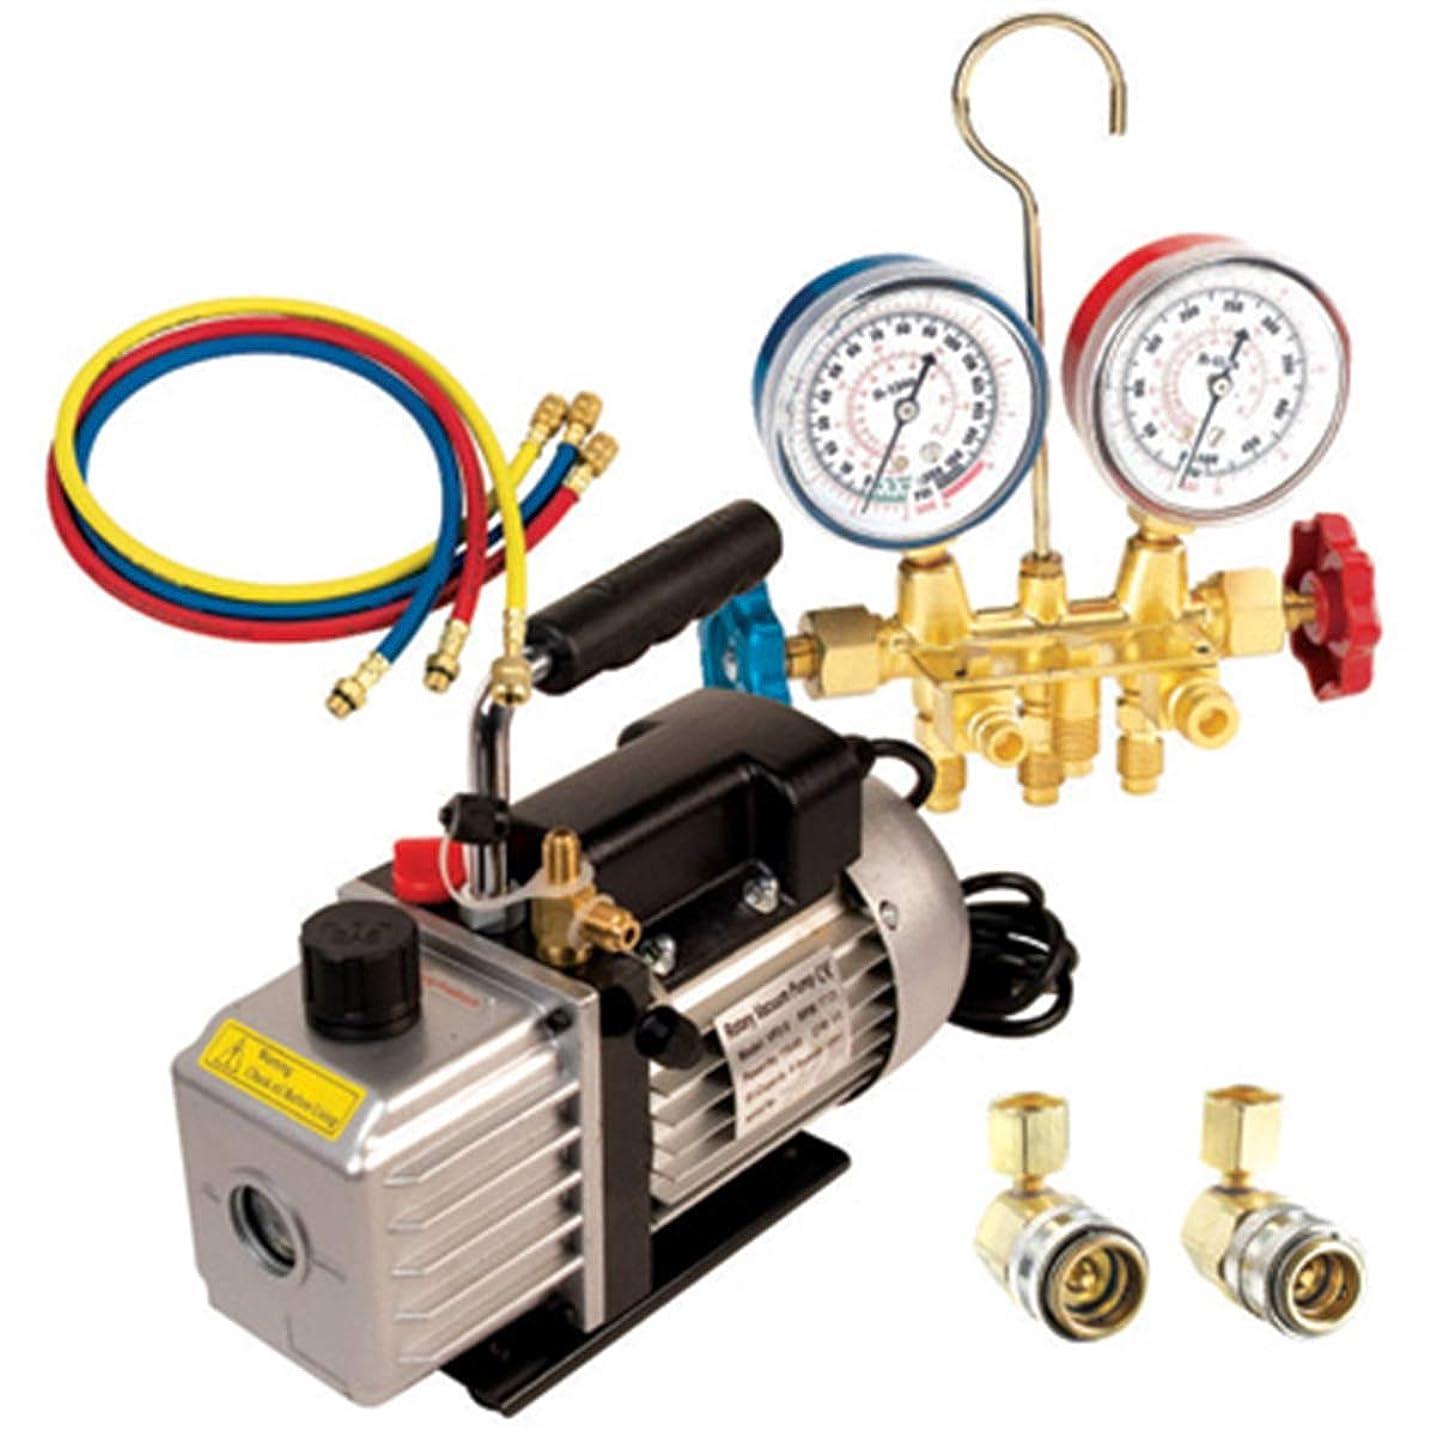 FJC FJC9281 Vacuum Pump & Gauge Set